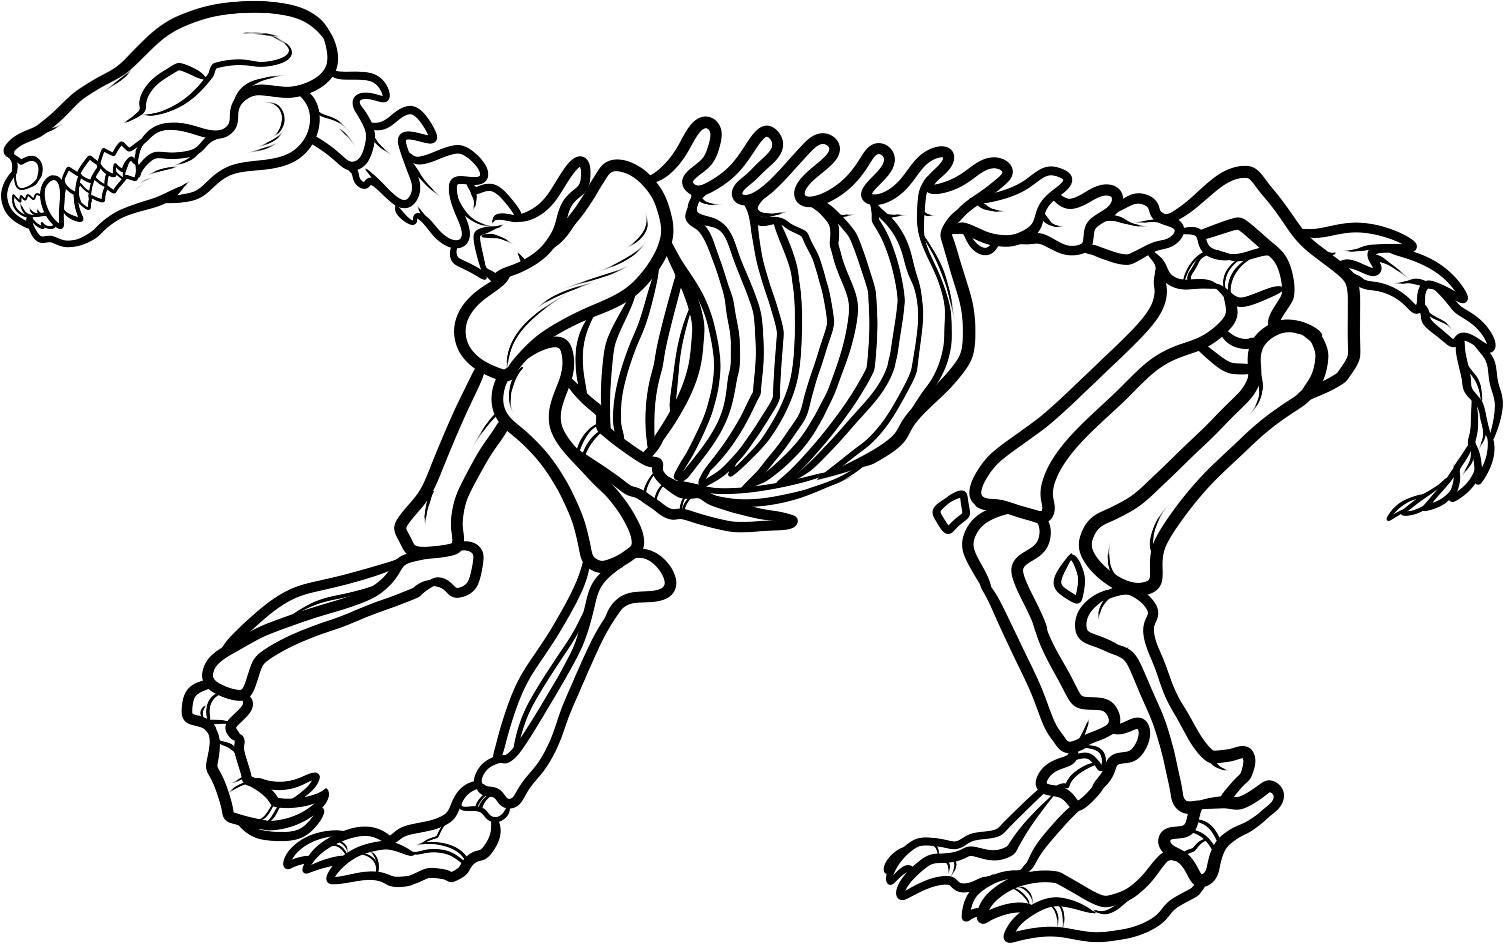 skeleton coloring pages - Free Large Images | dinosaur cake | Pinterest